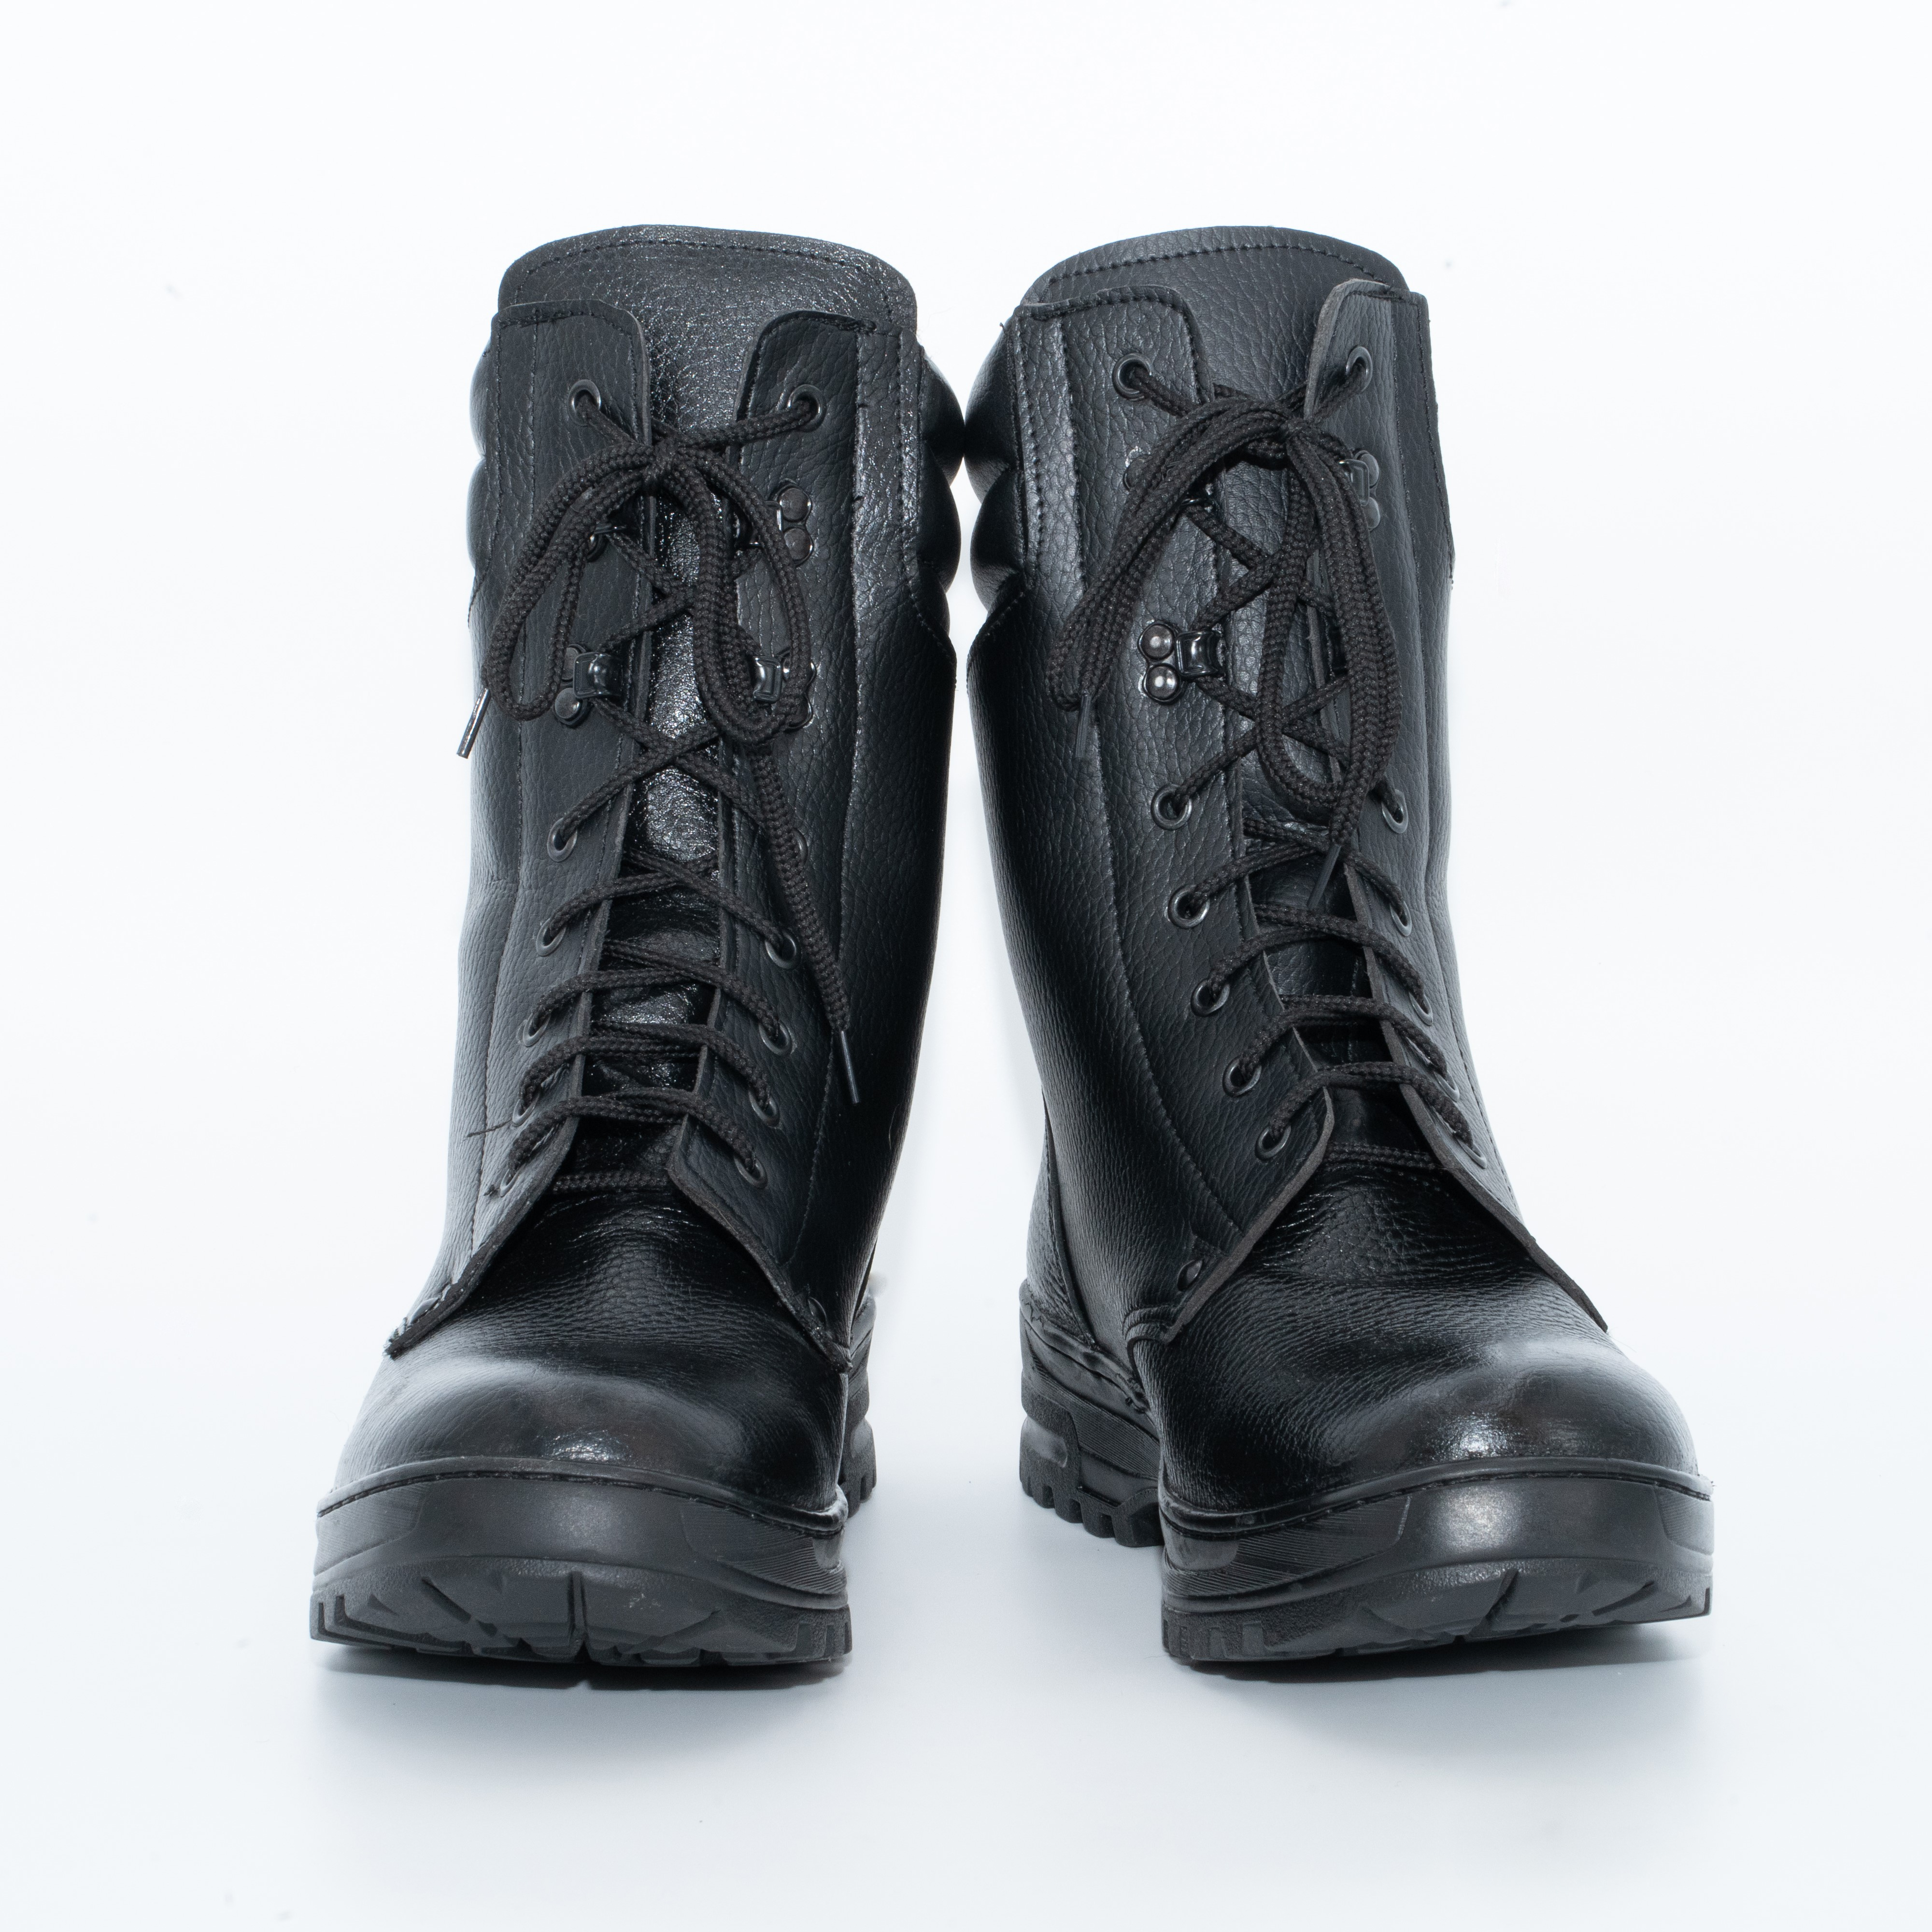 Ботинки мужские  65 РНМ1